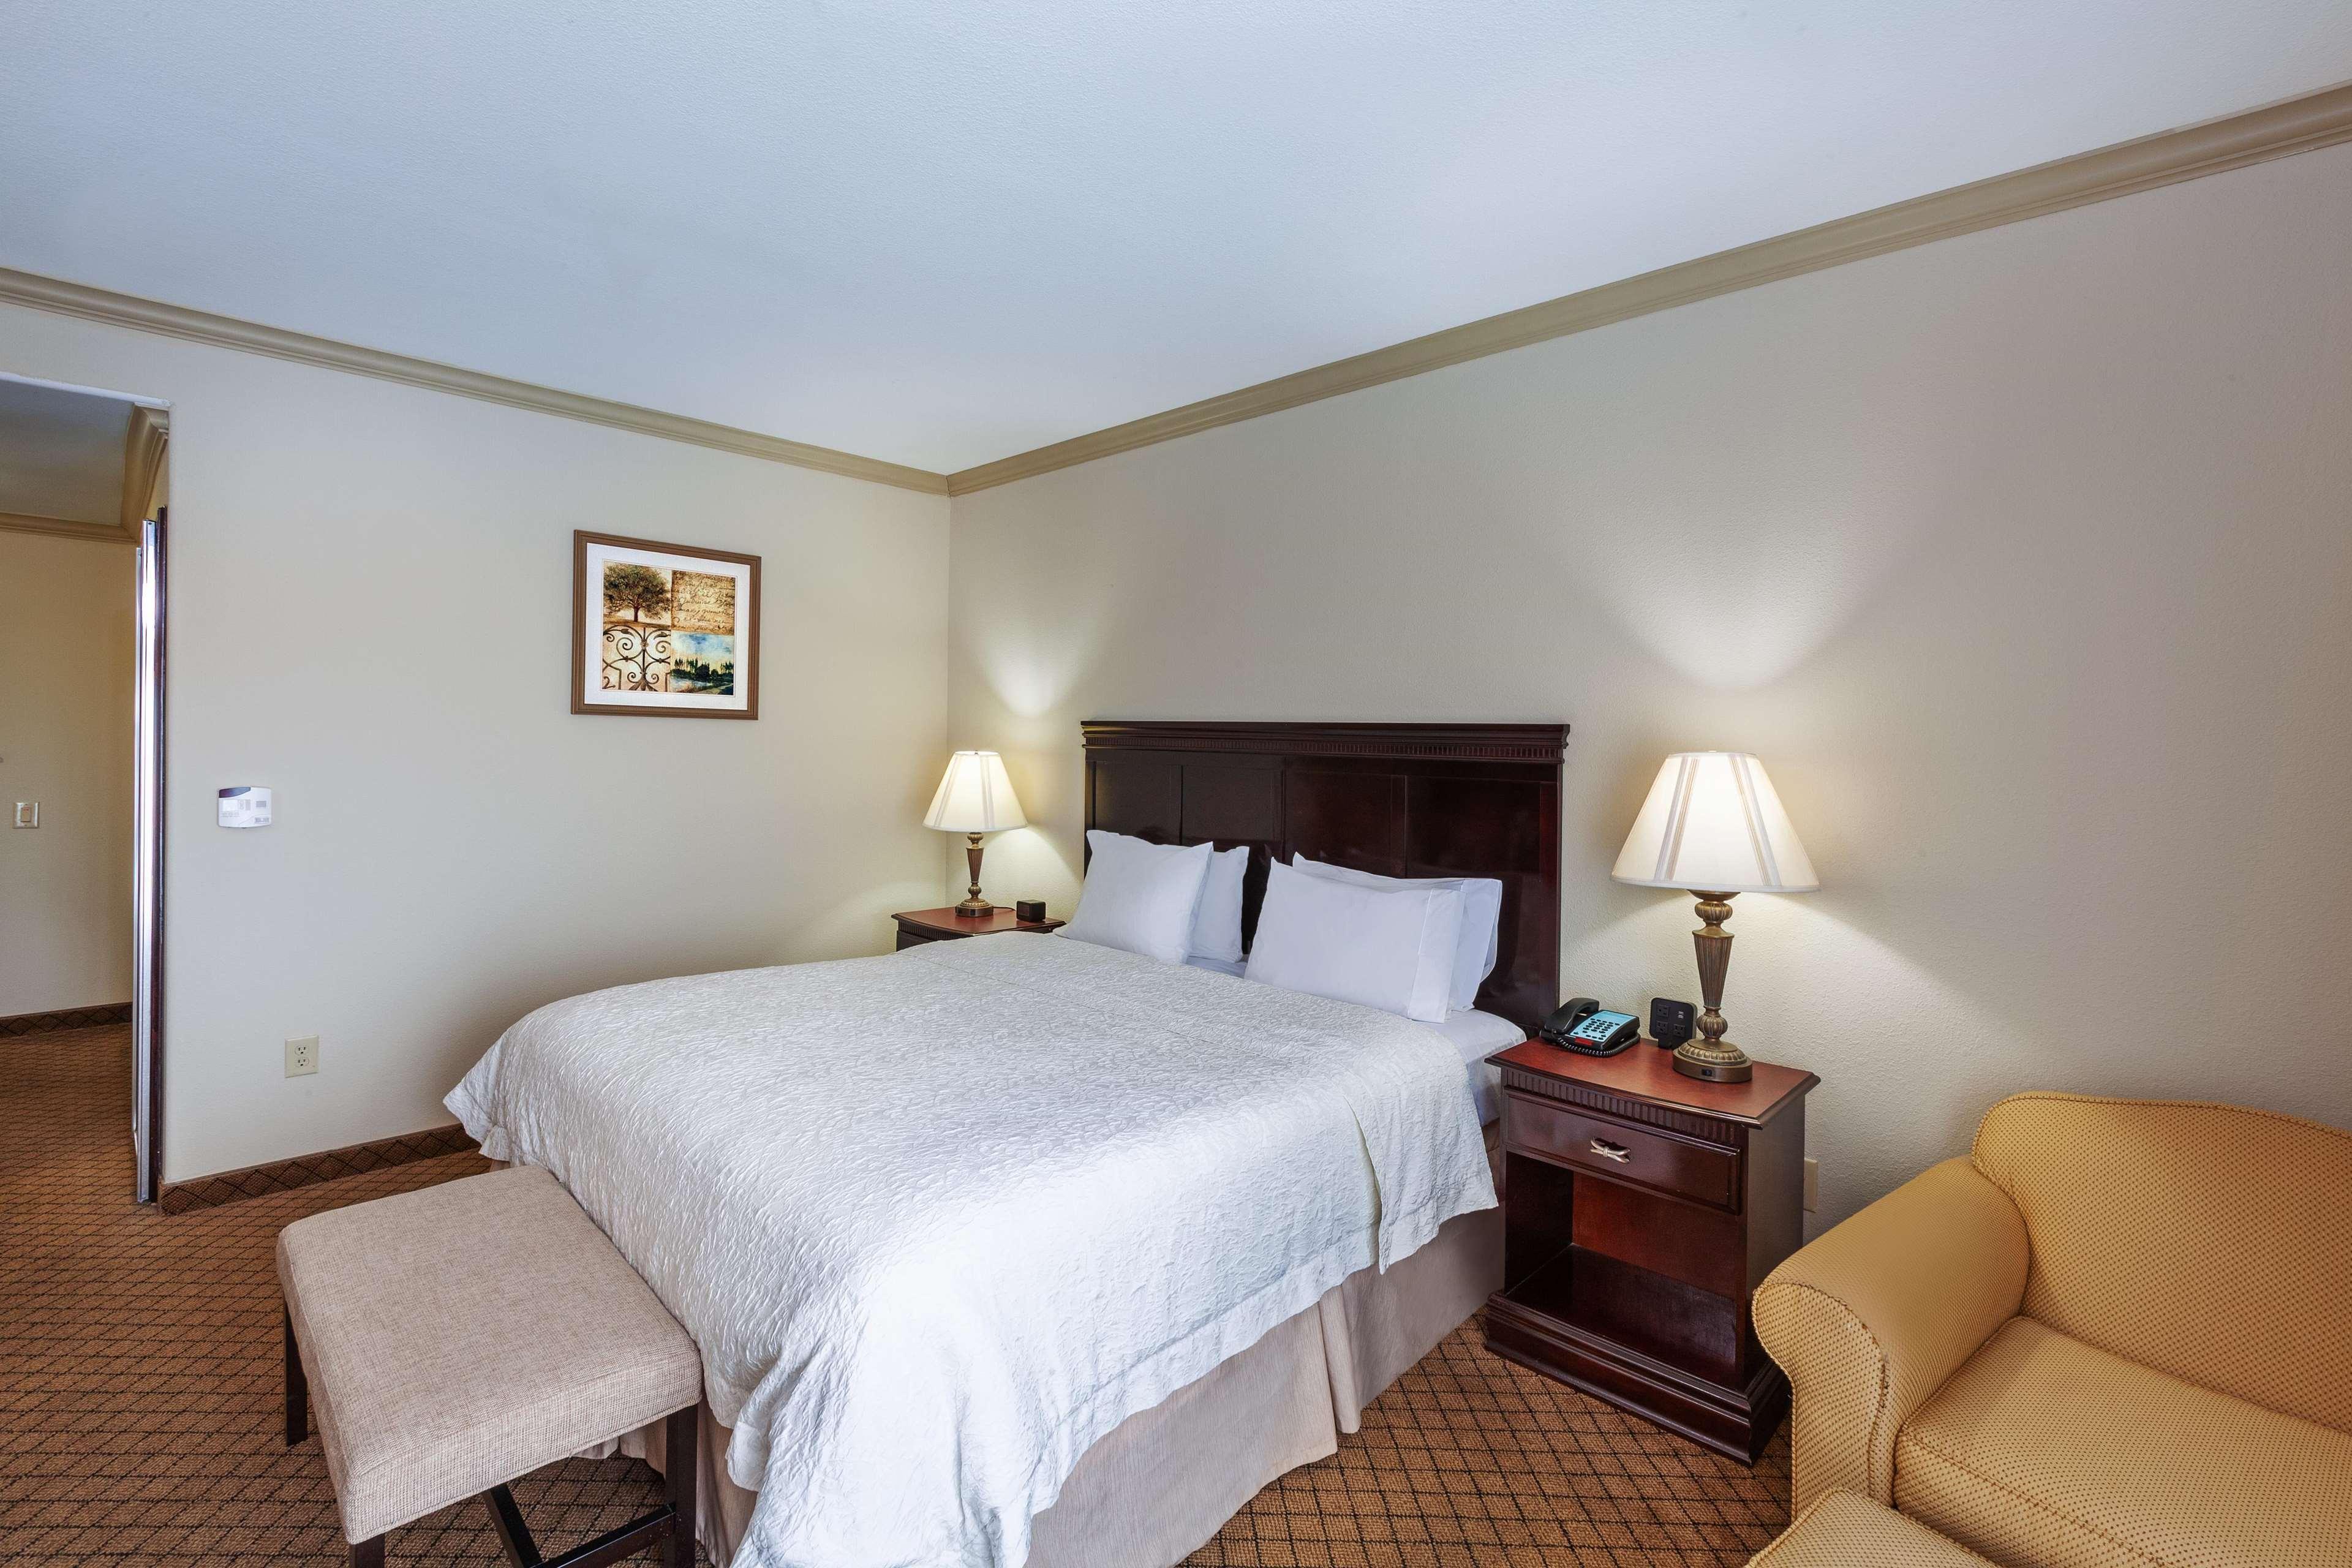 Hampton Inn & Suites Galveston image 18